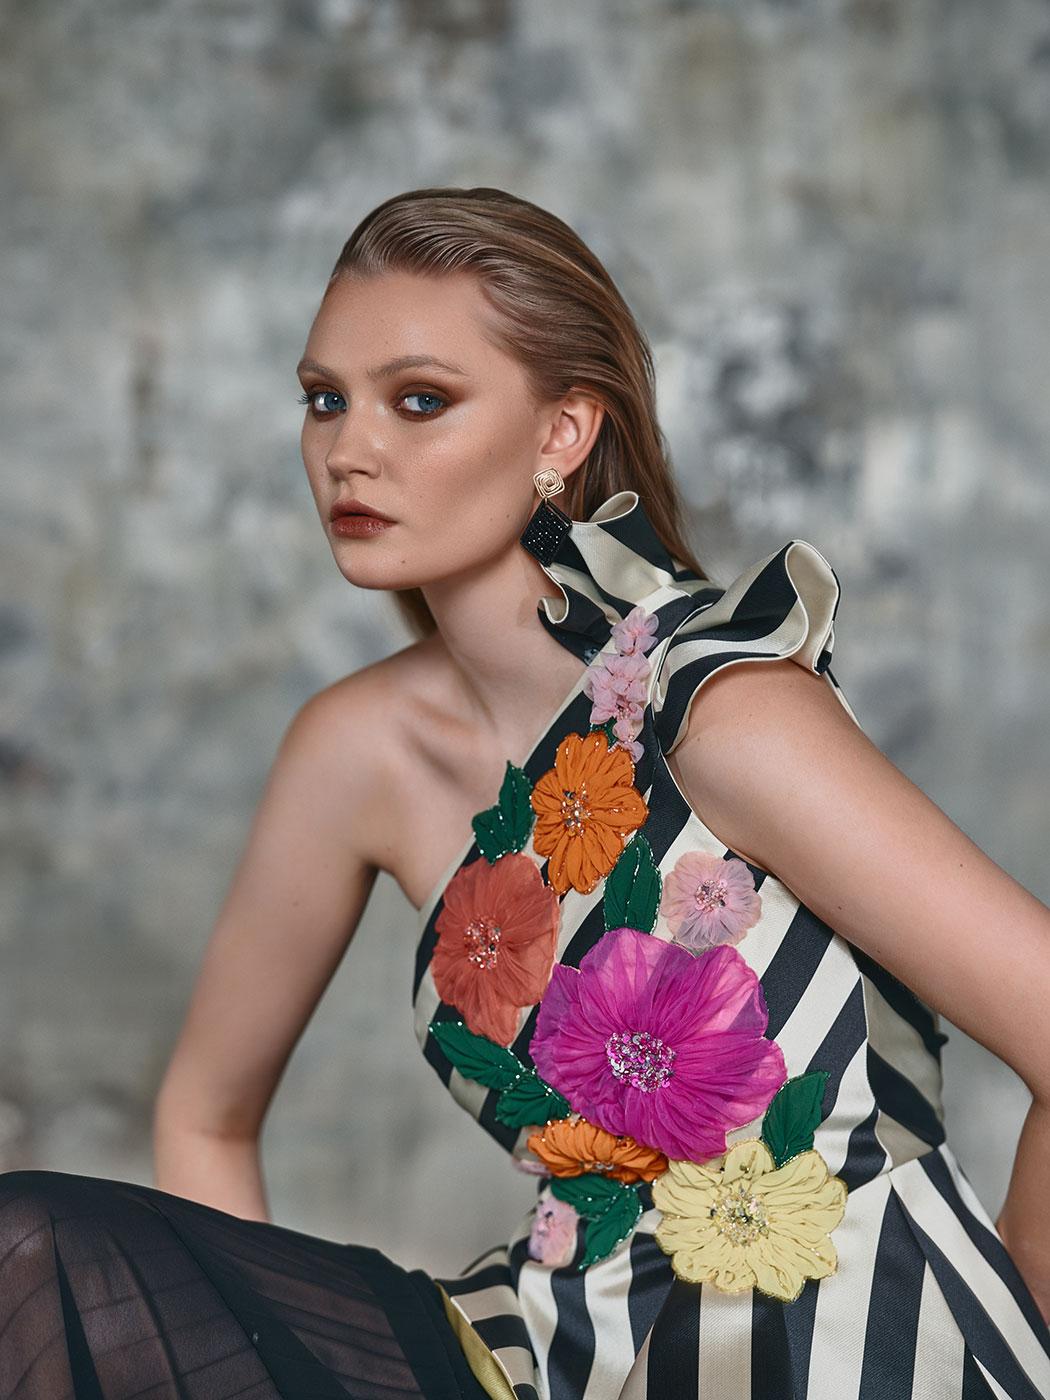 Bartin Couture